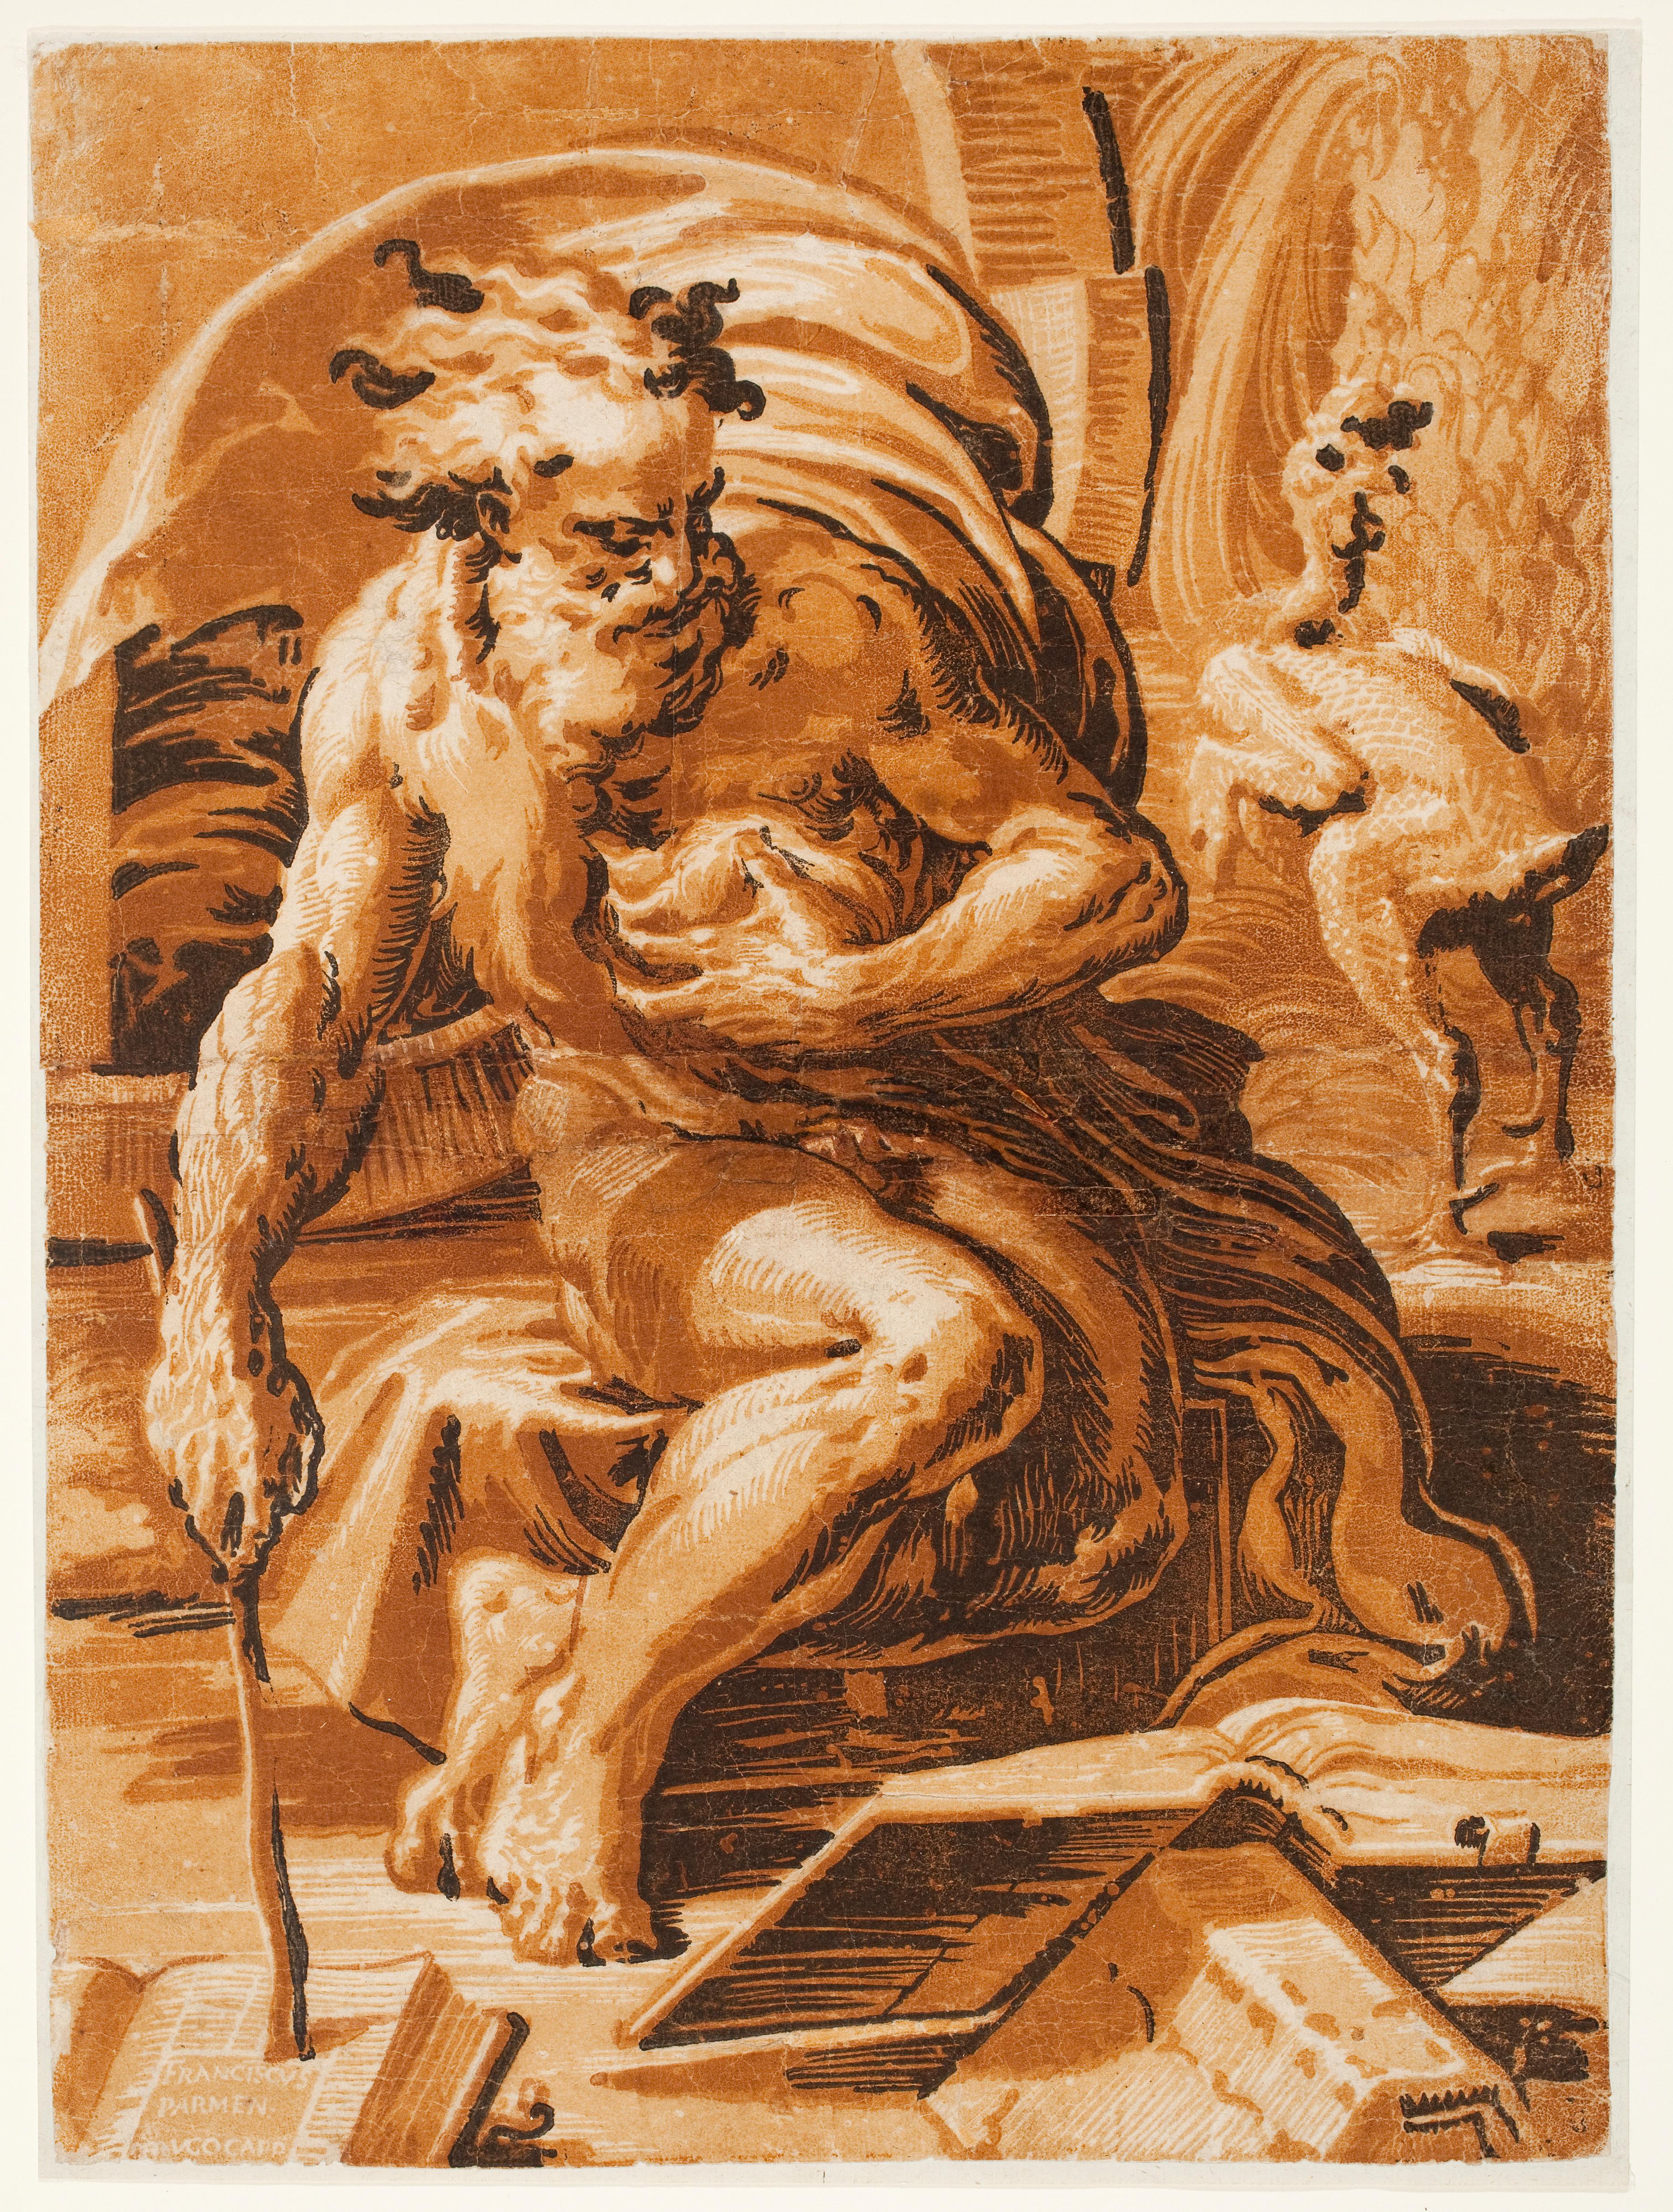 Ugo da Carpi (Italian, active 1502–1532), after Parmigianino (Italian, 1503–1540), Diogenes, ca. 1527.Color chiaroscuro woodcut. Milwaukee Art Museum, Gift of Howard L. Zetteler through Print Forum, in memory of Evelyn H. Zetteler, his wife M1983.8. Photo credit: John R. Glembin.